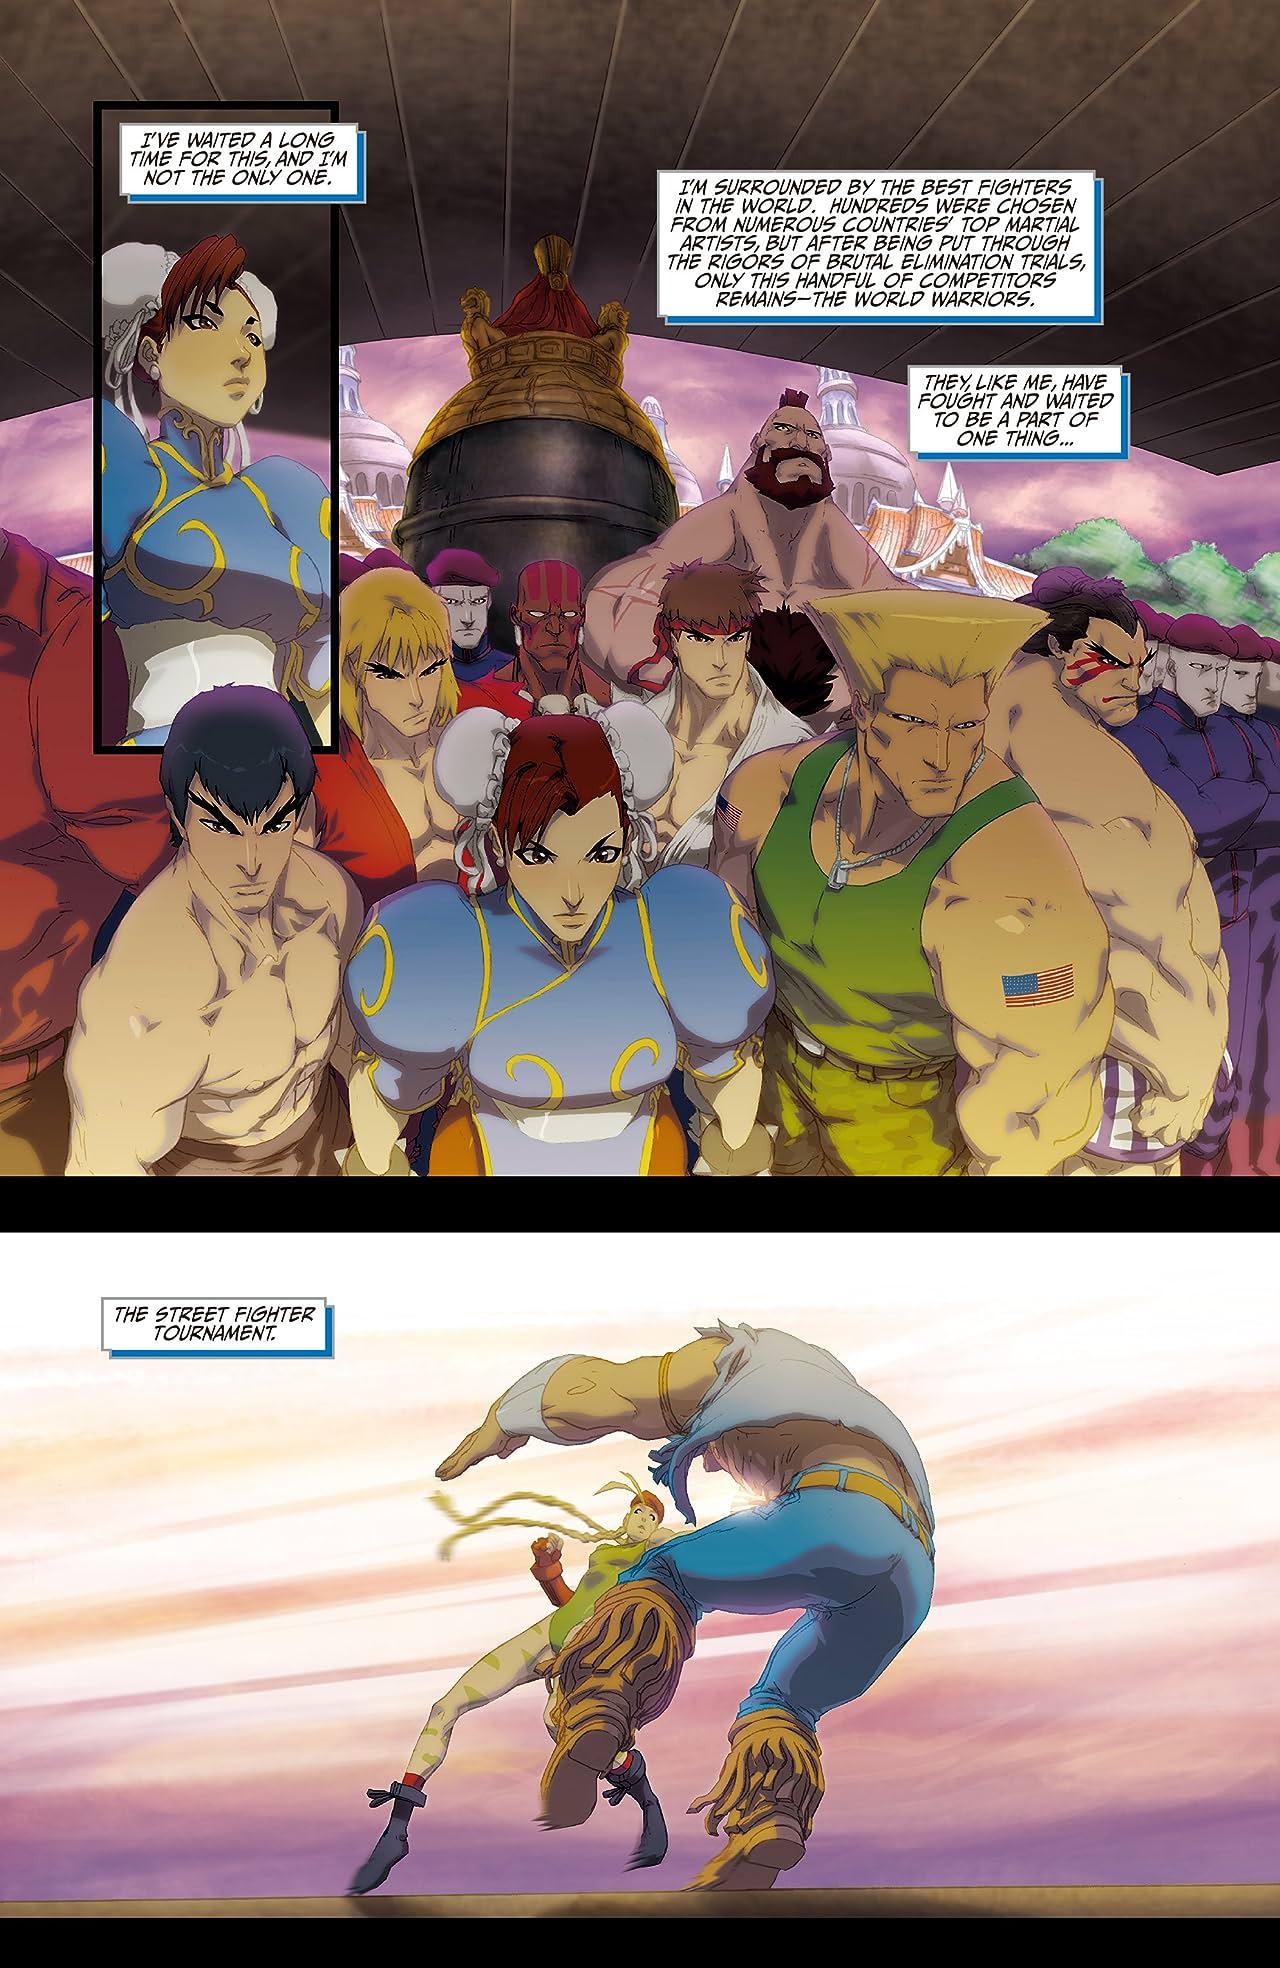 Street Fighter II Turbo #1